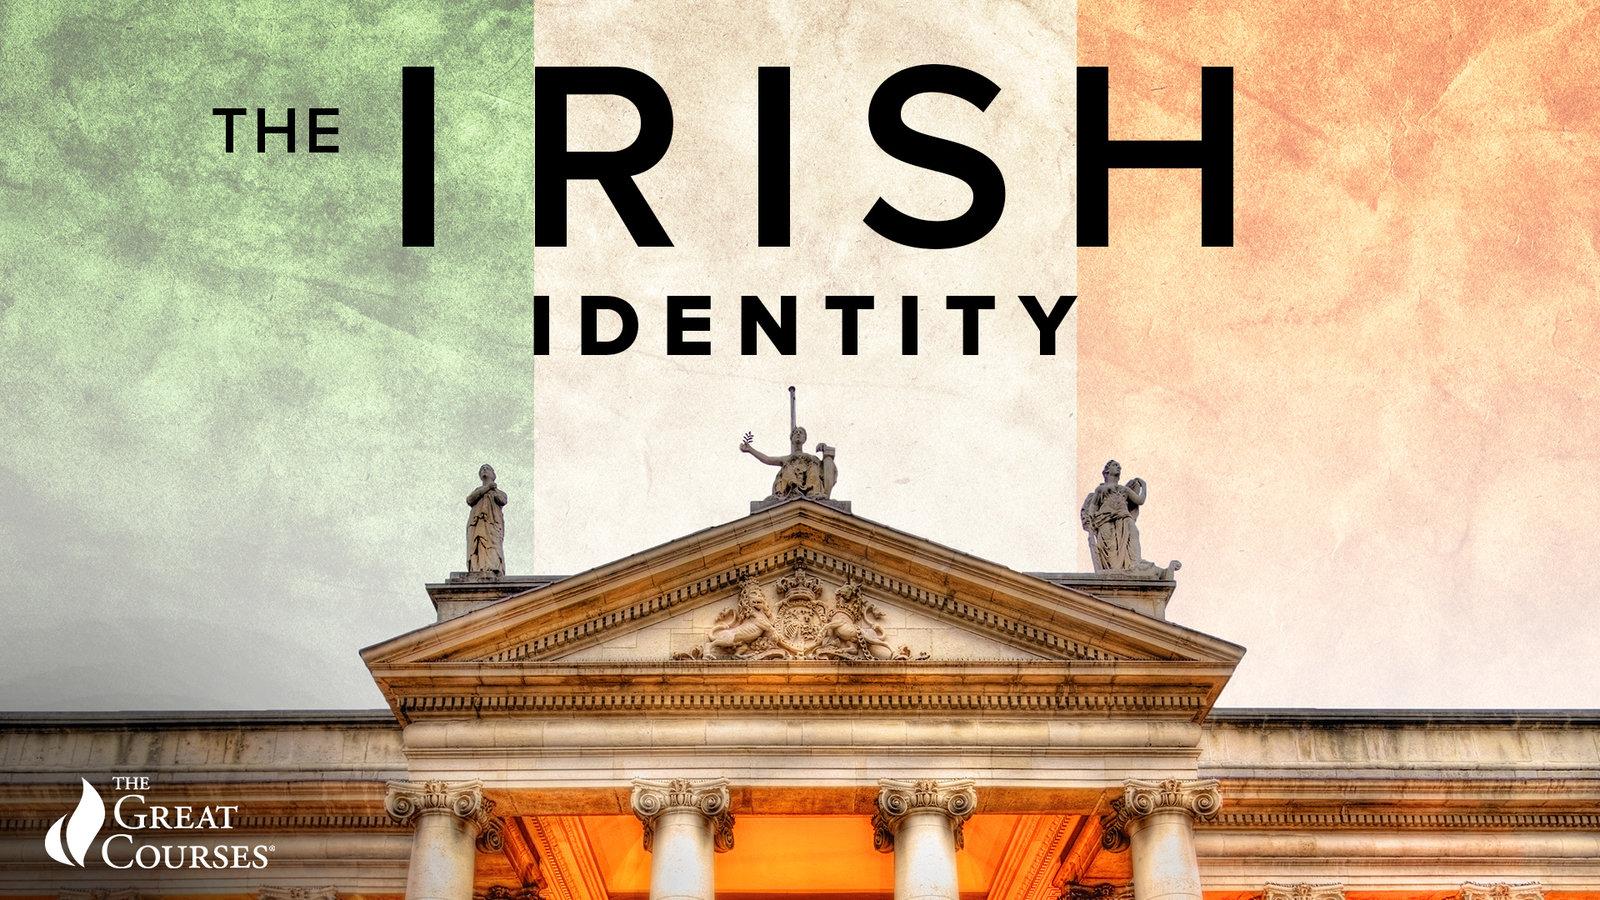 The Irish Identity - Independence, History, and Literature